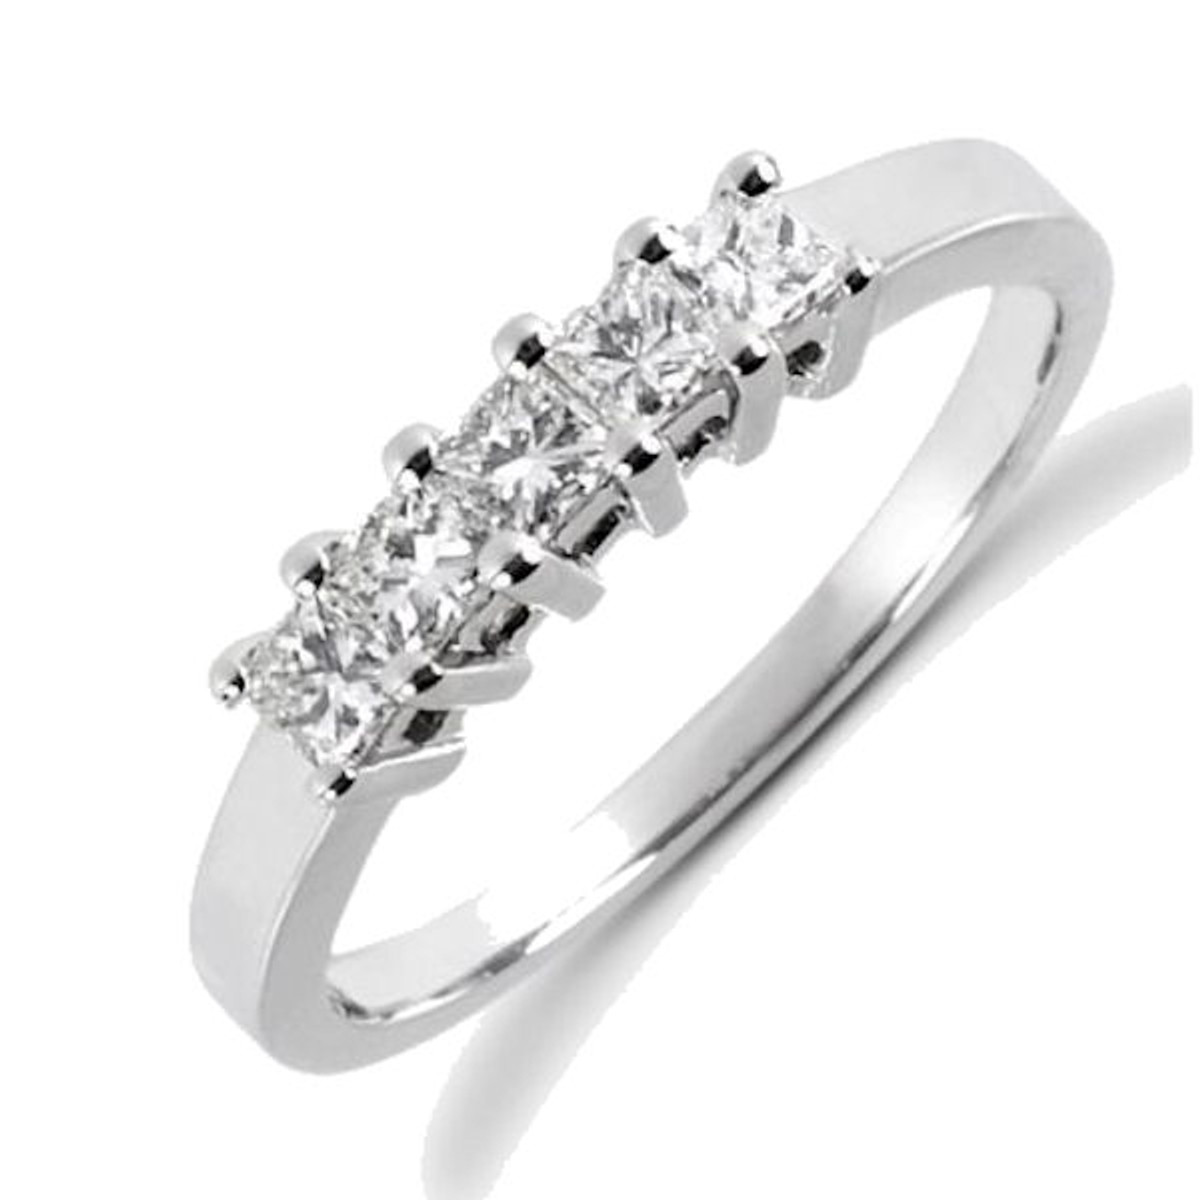 0.50 Ct Tw 5 stone princess cut anniversary ring